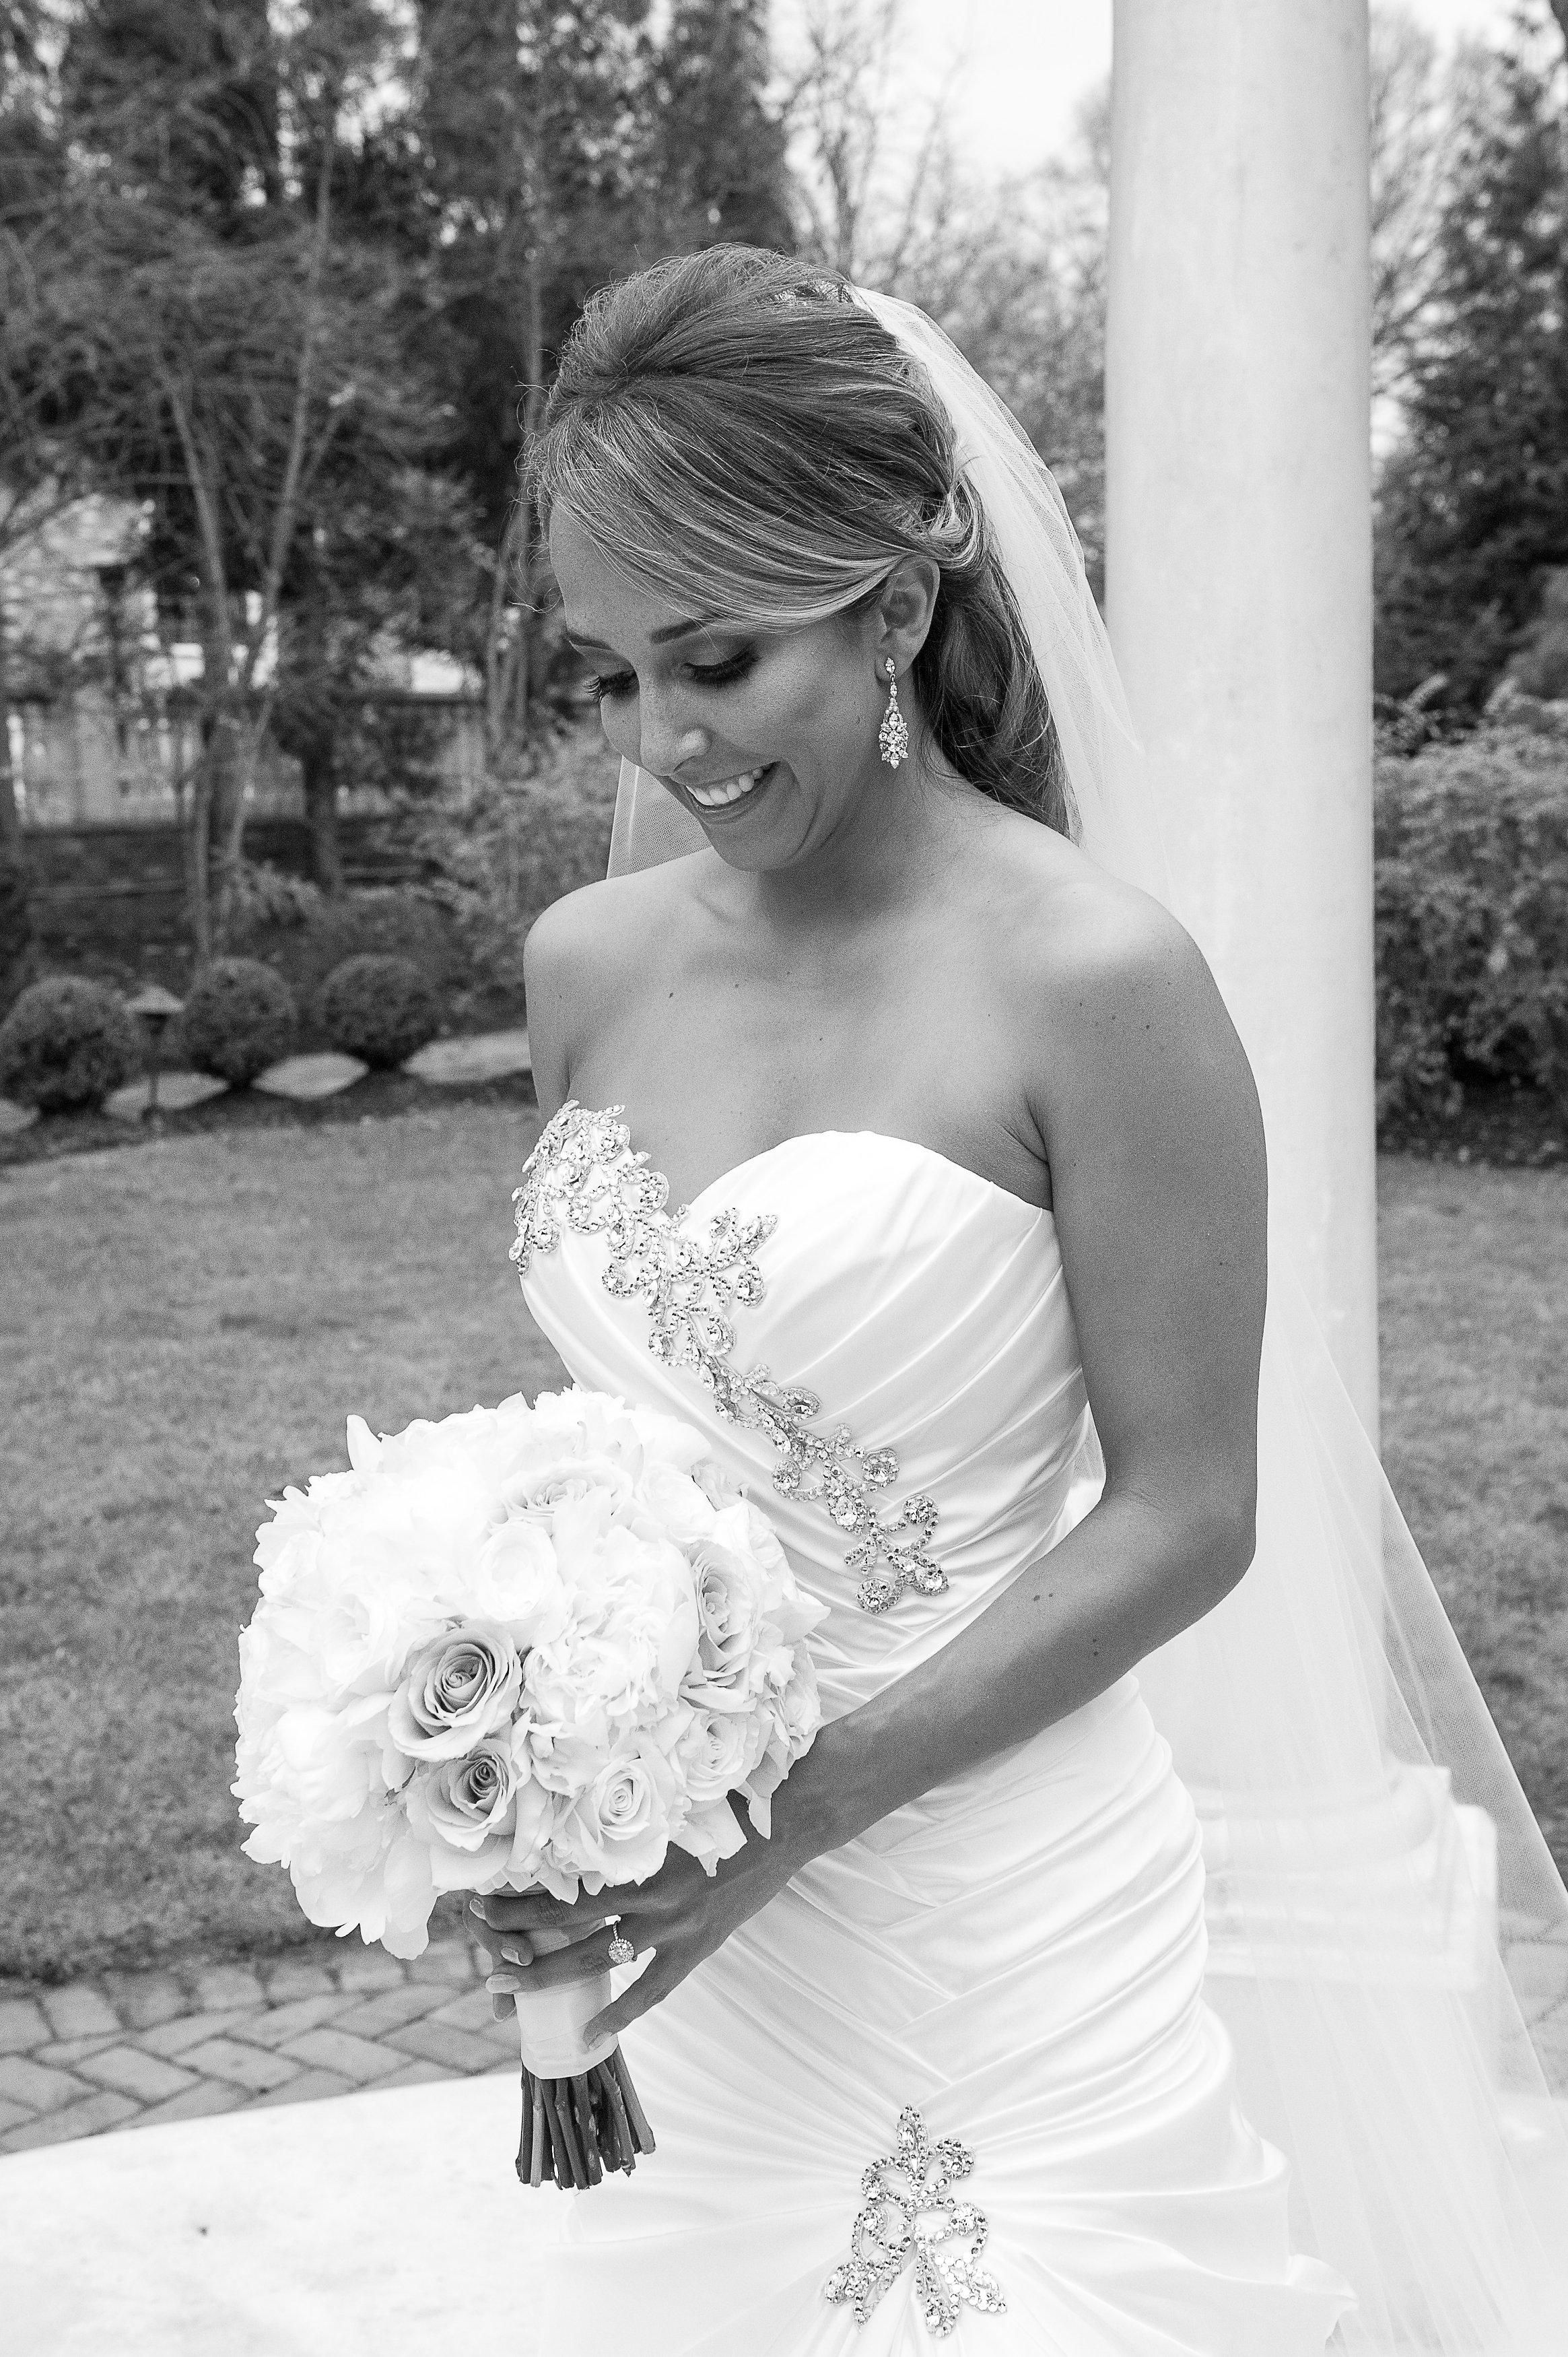 Ceci_New_York_Custom_Invitation_ New_Jersey_Wedding_Luxury_Personalized_Ceci_Style_Bride_Foil_Stamping87.JPG